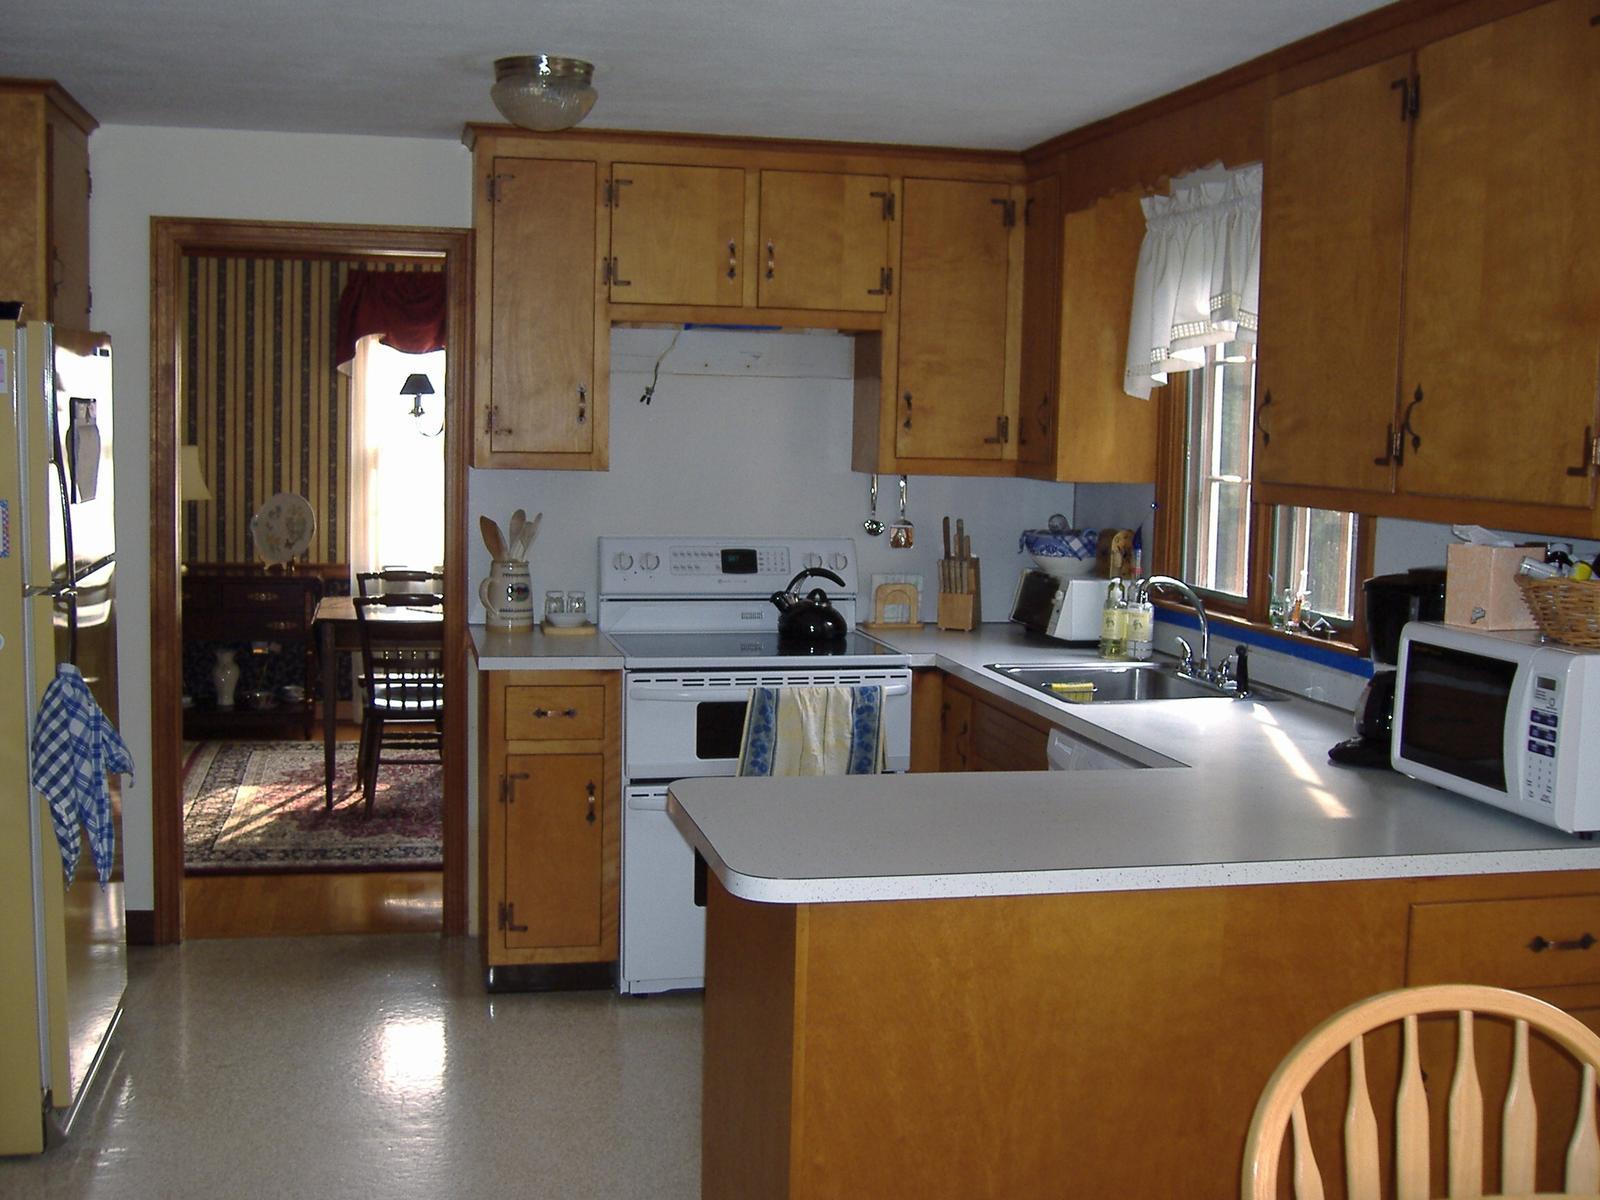 granite kitchen remodeling hartford area remodeling kitchens Granite Kitchen remodeling Hartford area